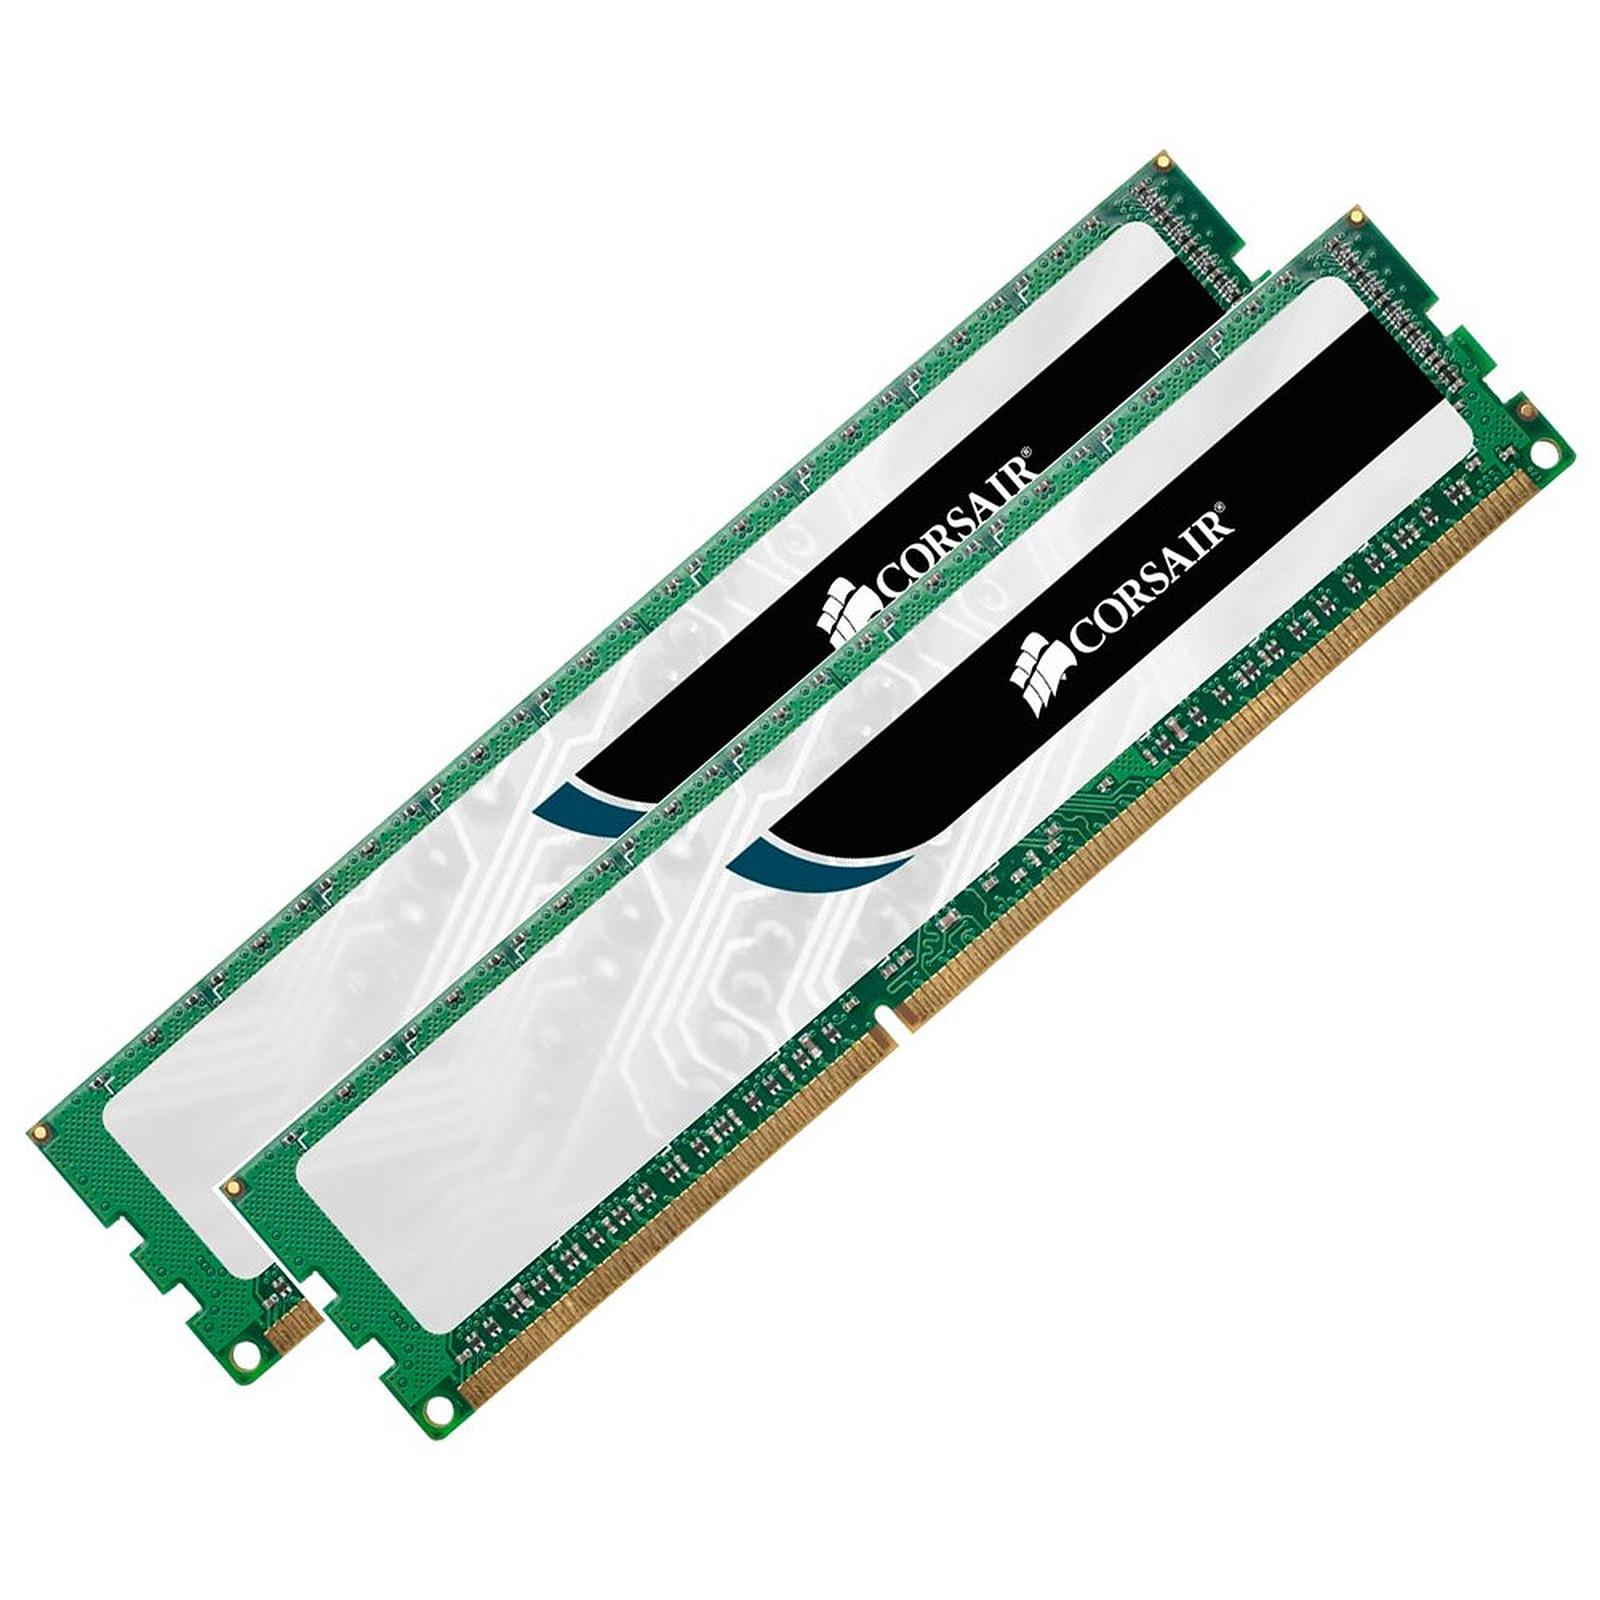 Corsair Value Select 16 Go (2 x 8 Go) DDR3 1333MHz CL9